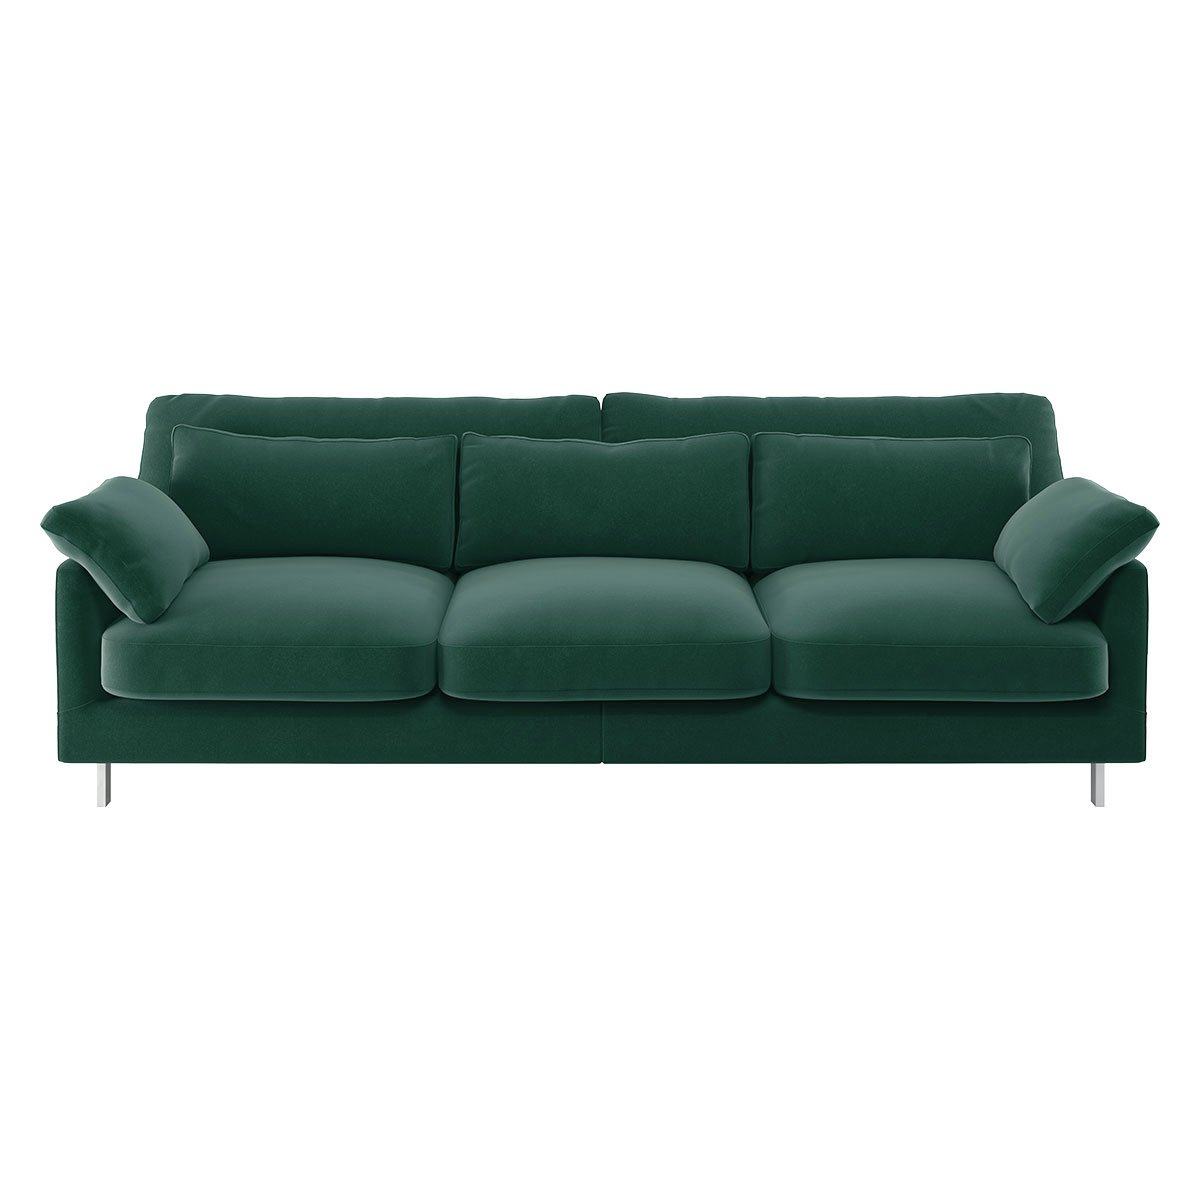 Habitat Cuscino 3 Seater Velvet Sofa - Emerald Green